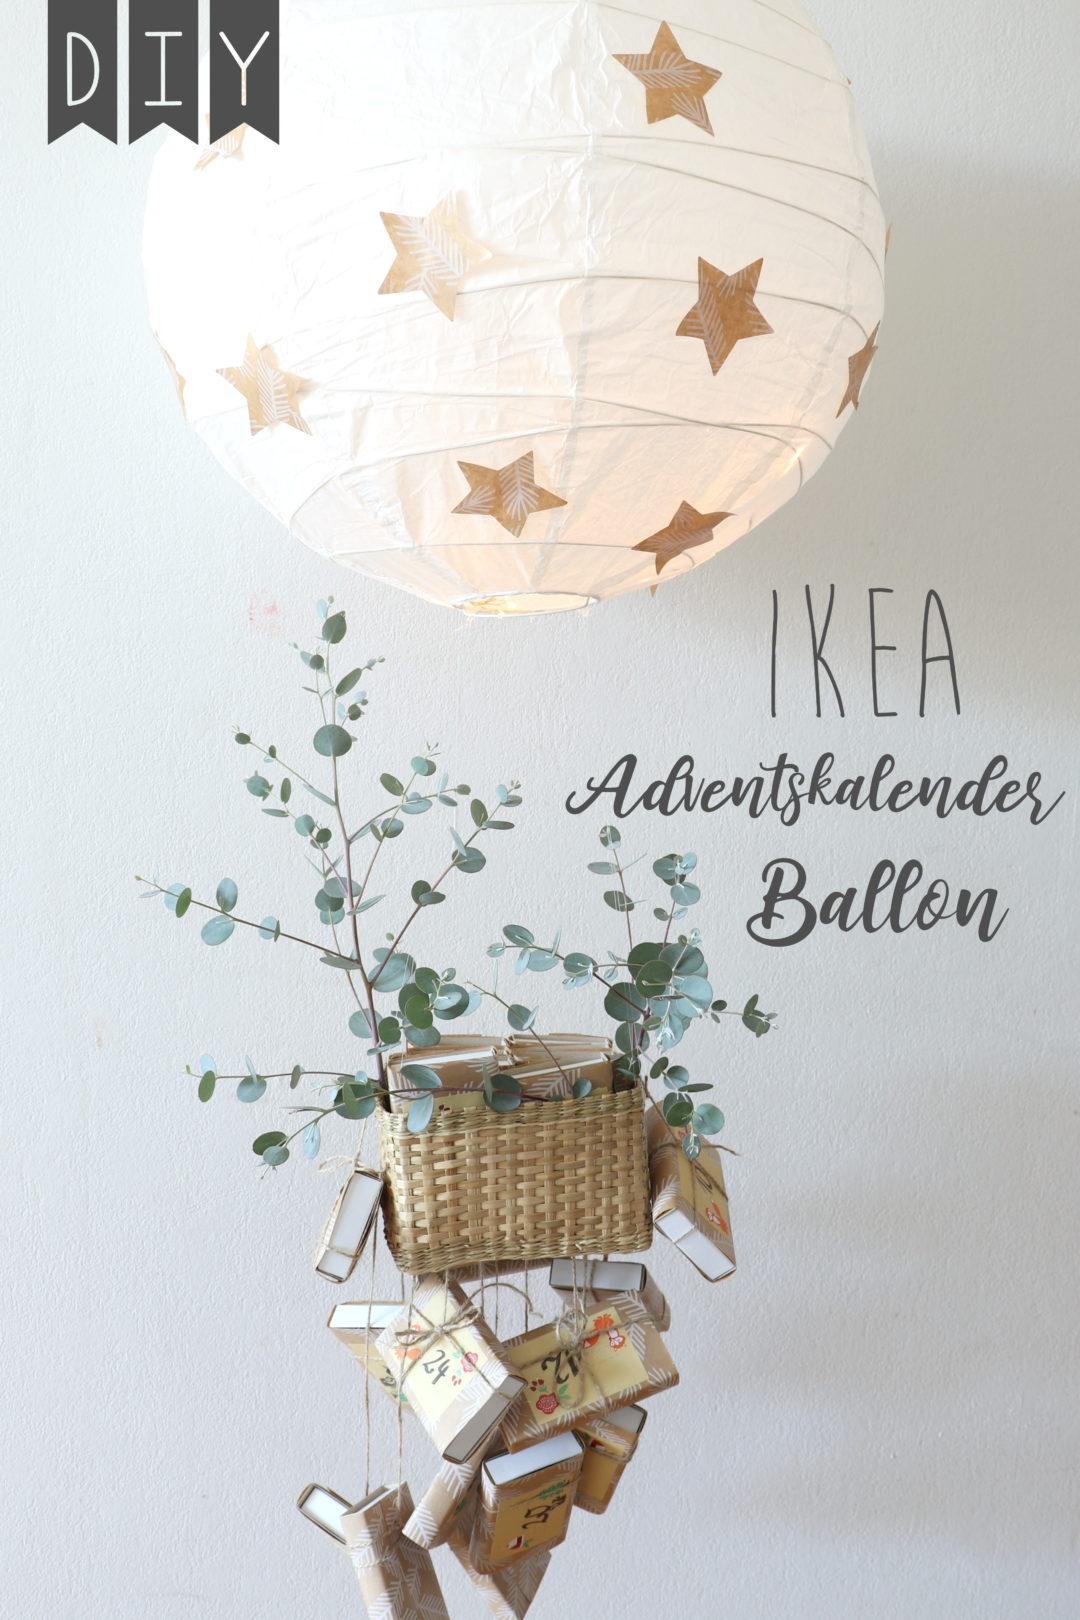 IKEA_Adventskalender_Ballon